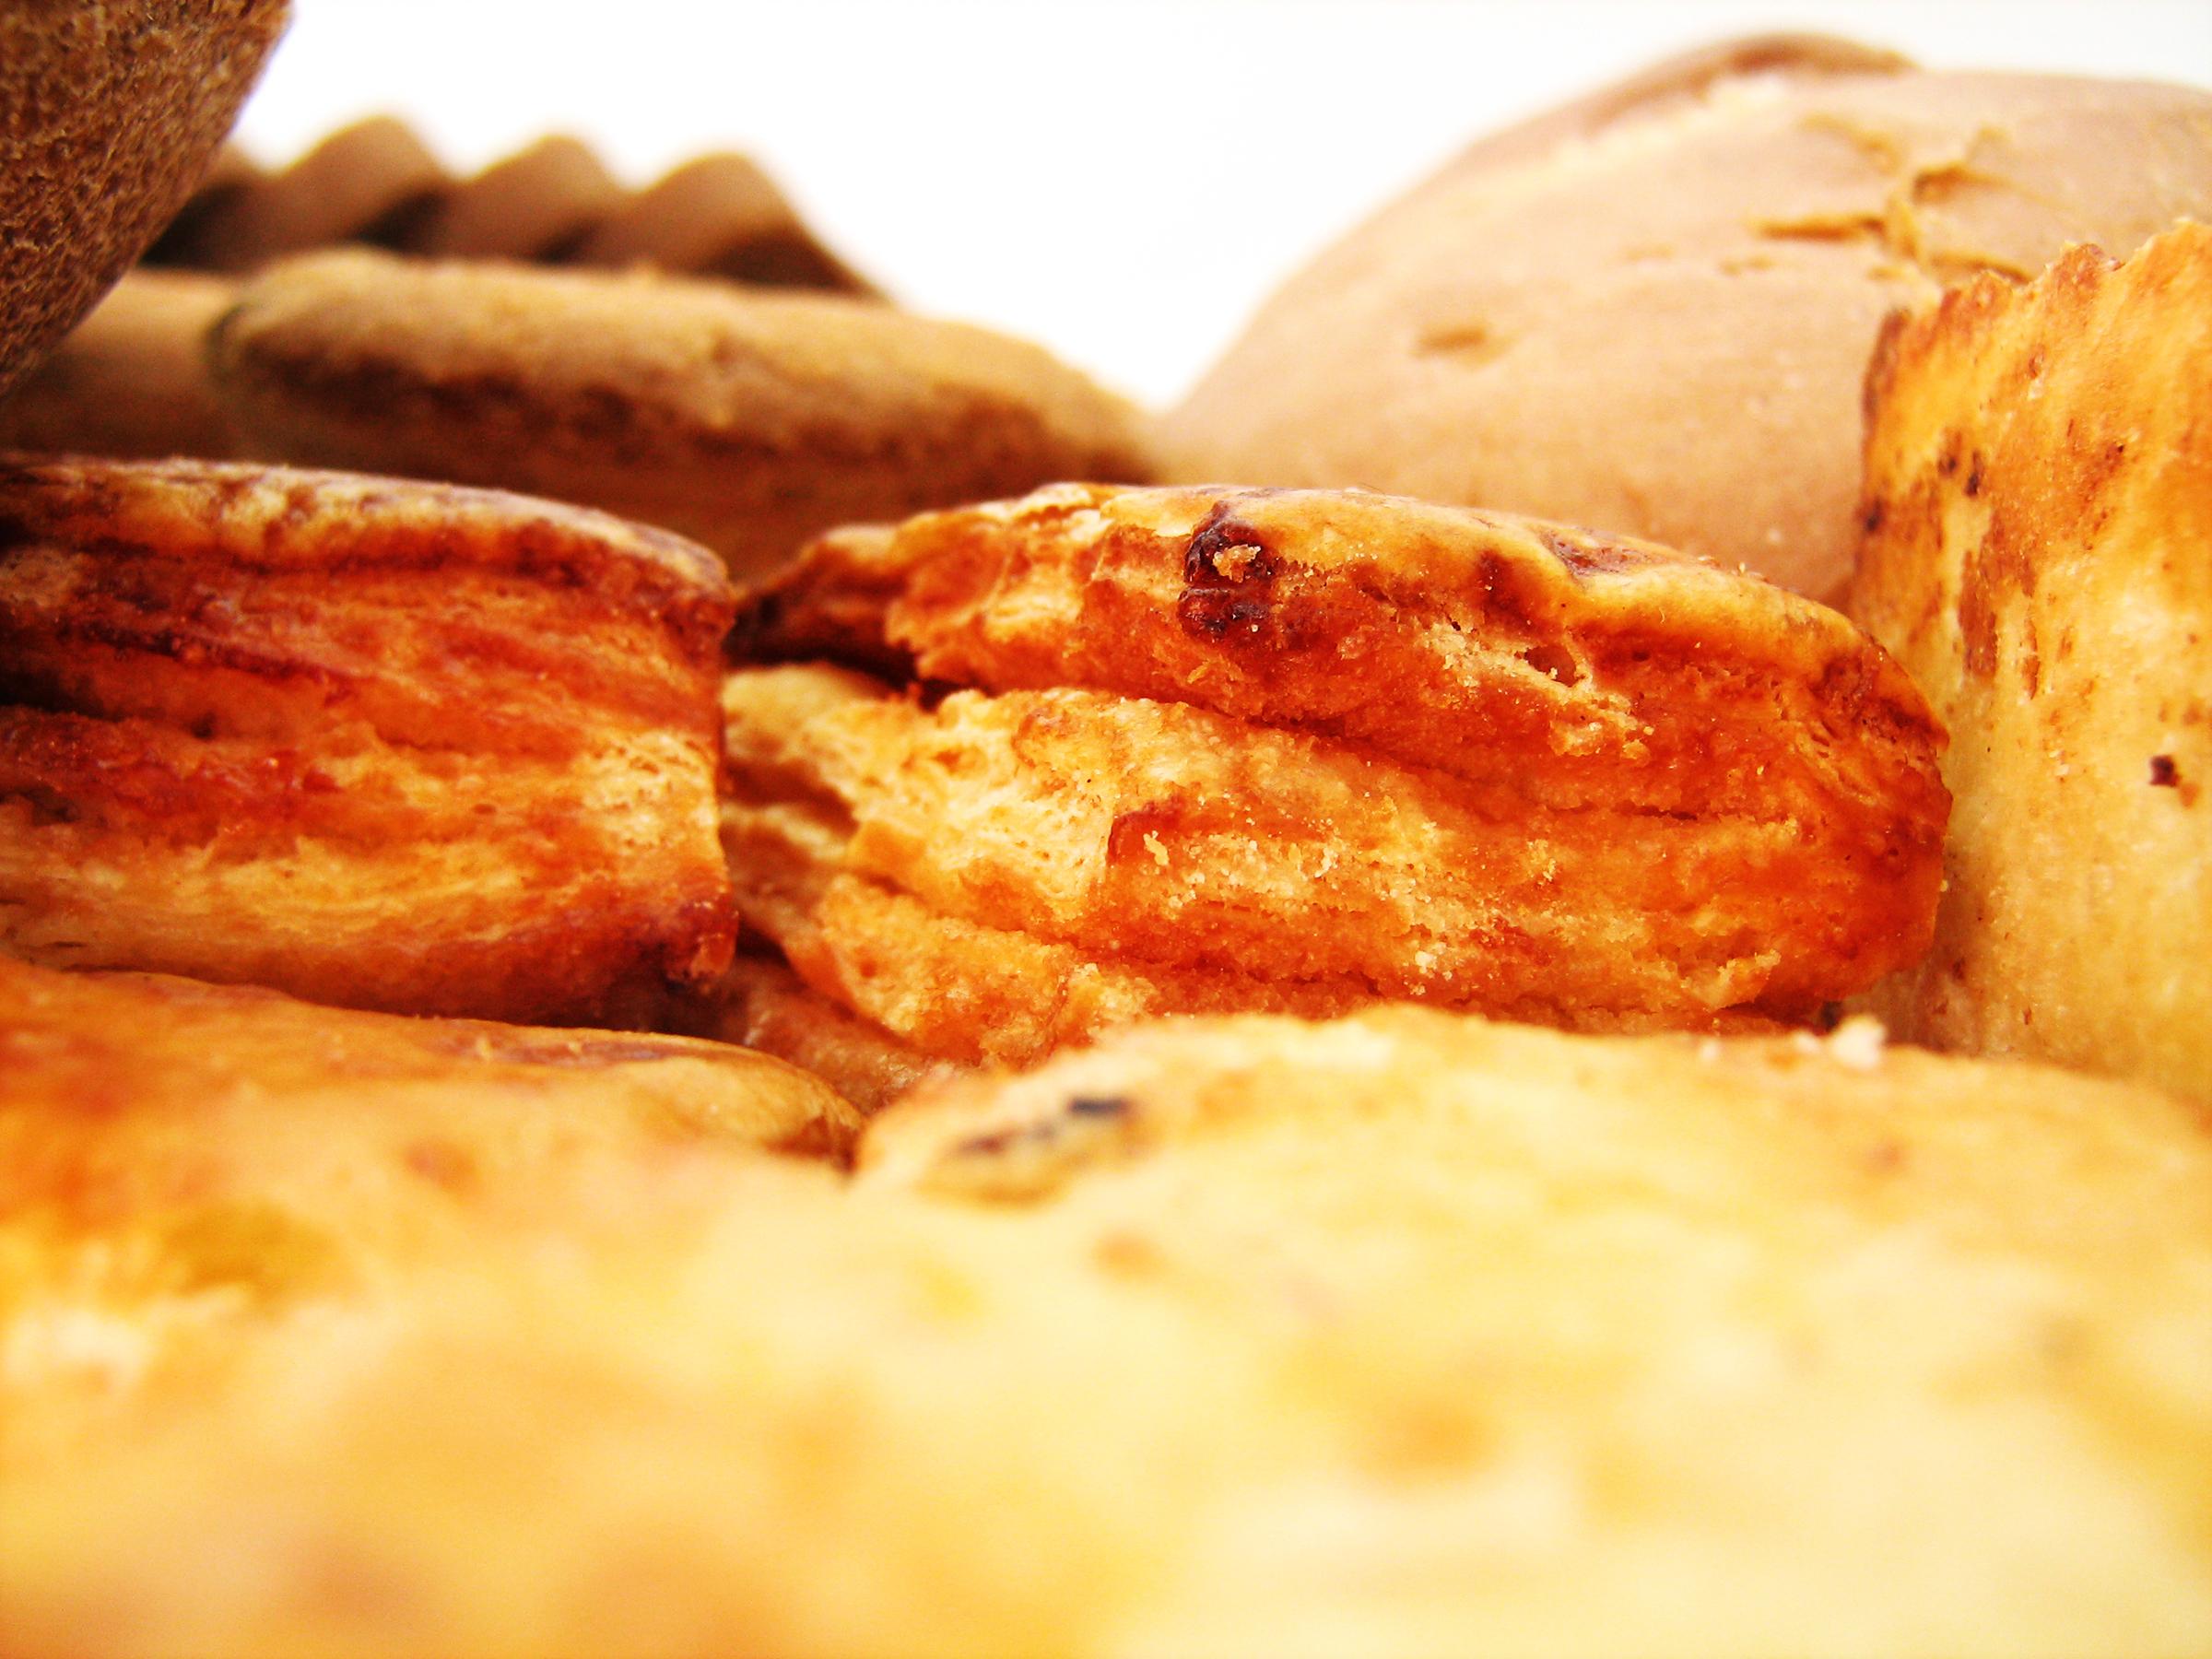 Buns, Bakery, Bread, Breakfast, Bun, HQ Photo